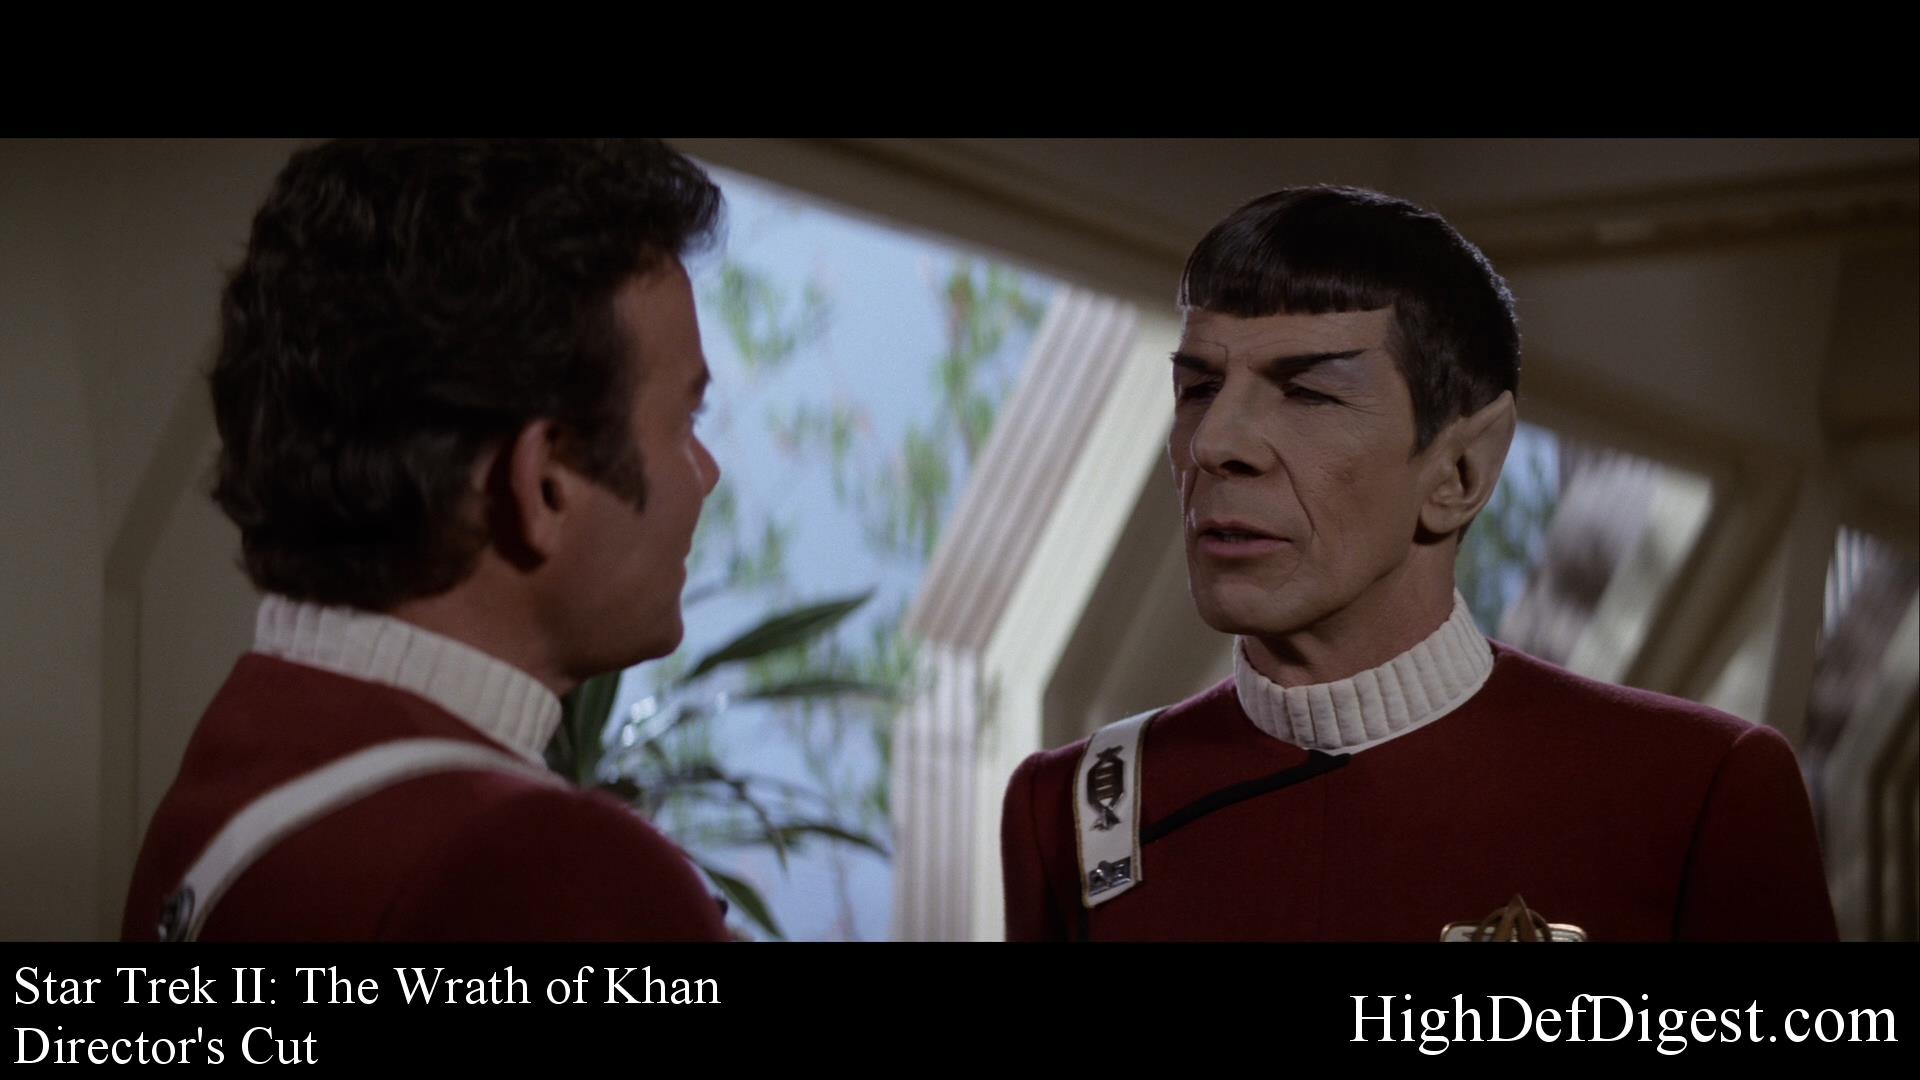 Star Trek: The Wrath of Khan - Comparison 1 (Director's Cut)